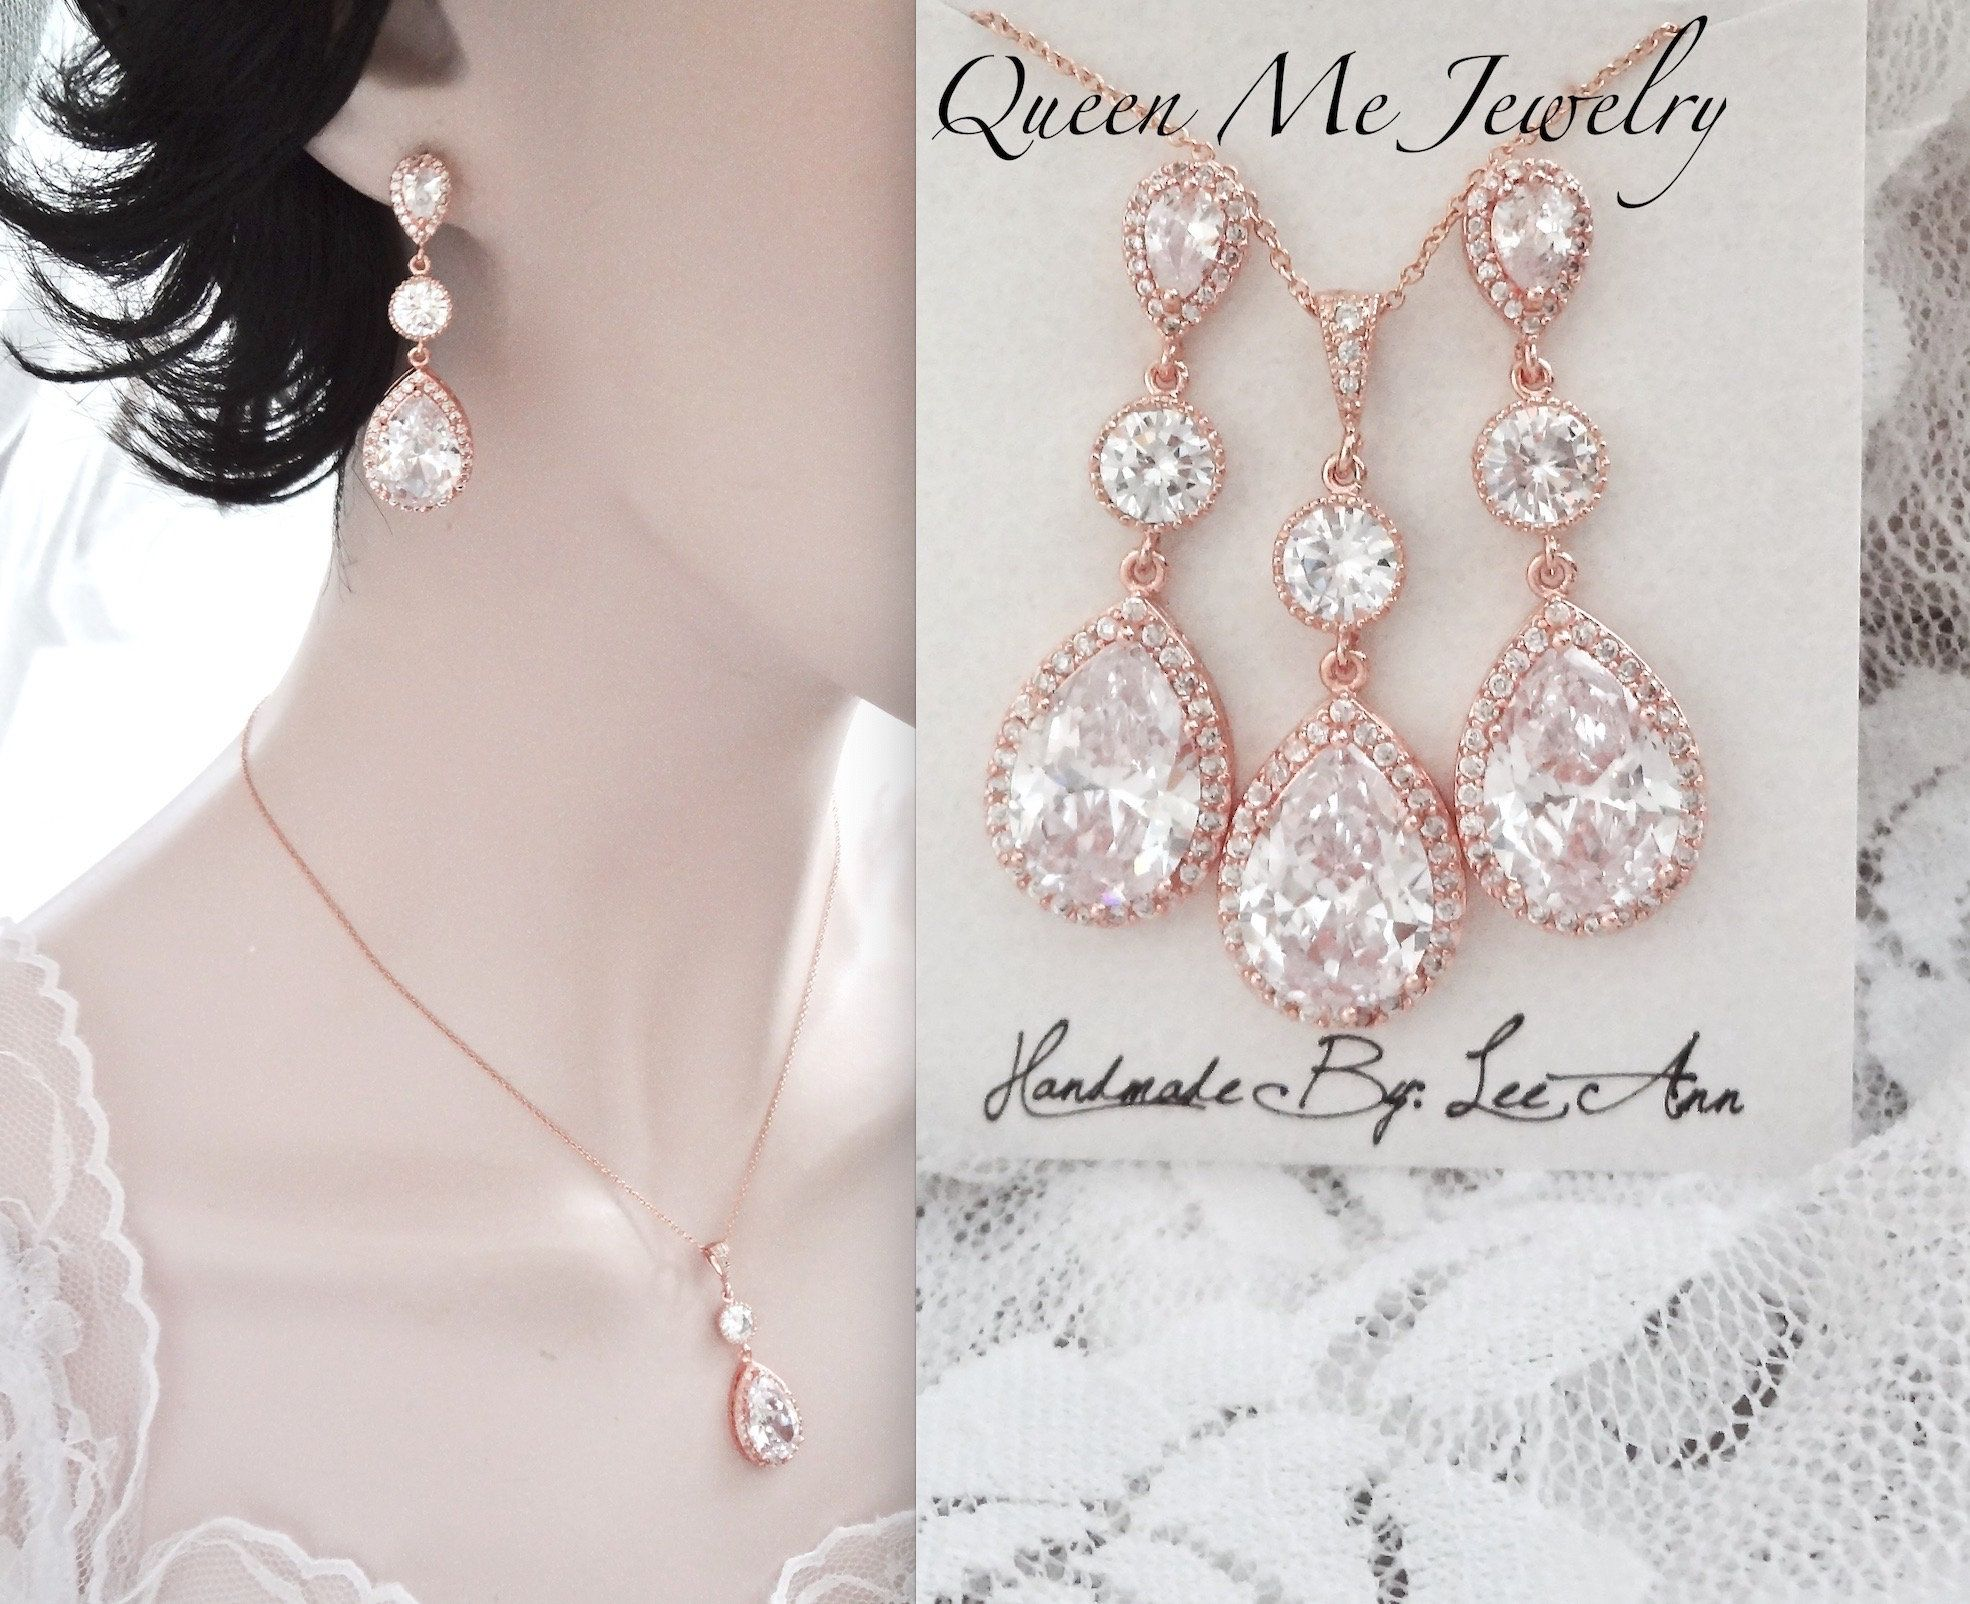 Wedding Bracelet Earrings set Zirconia Leaf Bracelet Earrings Wedding Jewelry Rose gold Bridal Bracelet set Bridesmaid Bracelet Gifts Fay